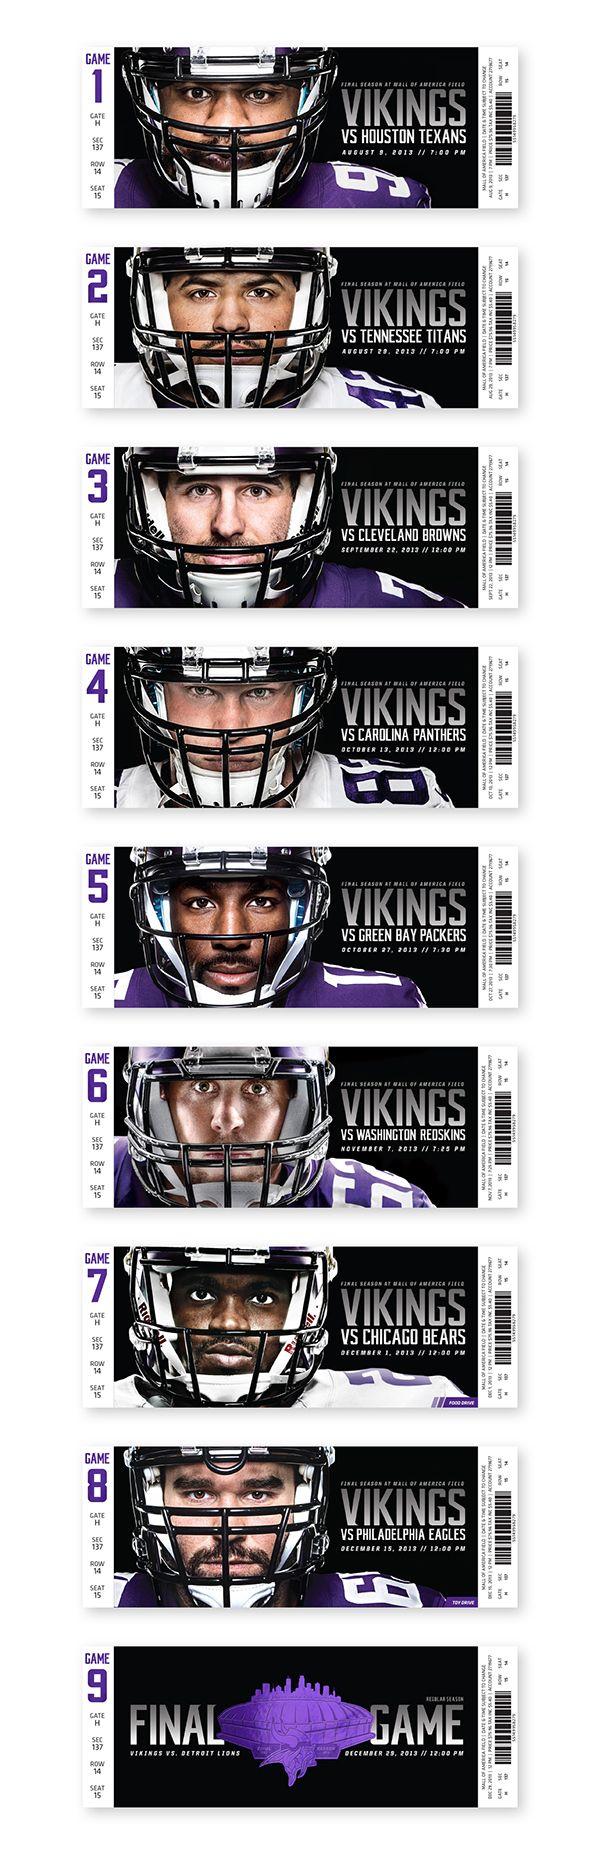 2013 Minnesota Vikings Season Tickets | Celebrating the Final Season at Mall of America Field